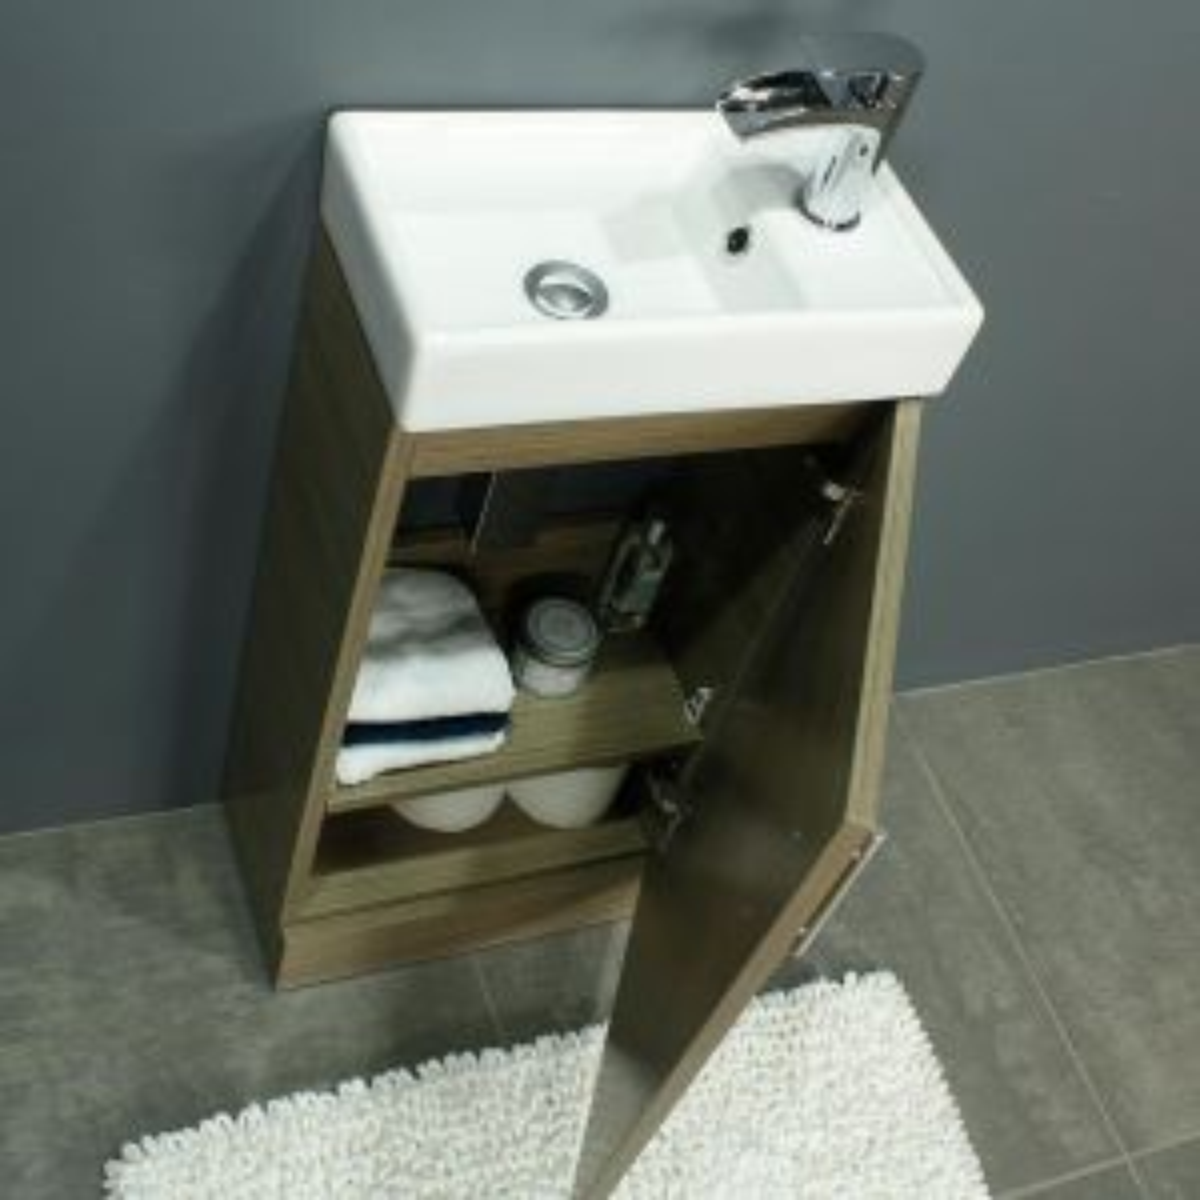 RAK Series 600 Toilet and 400 Series Medium Oak Vanity Unit Door